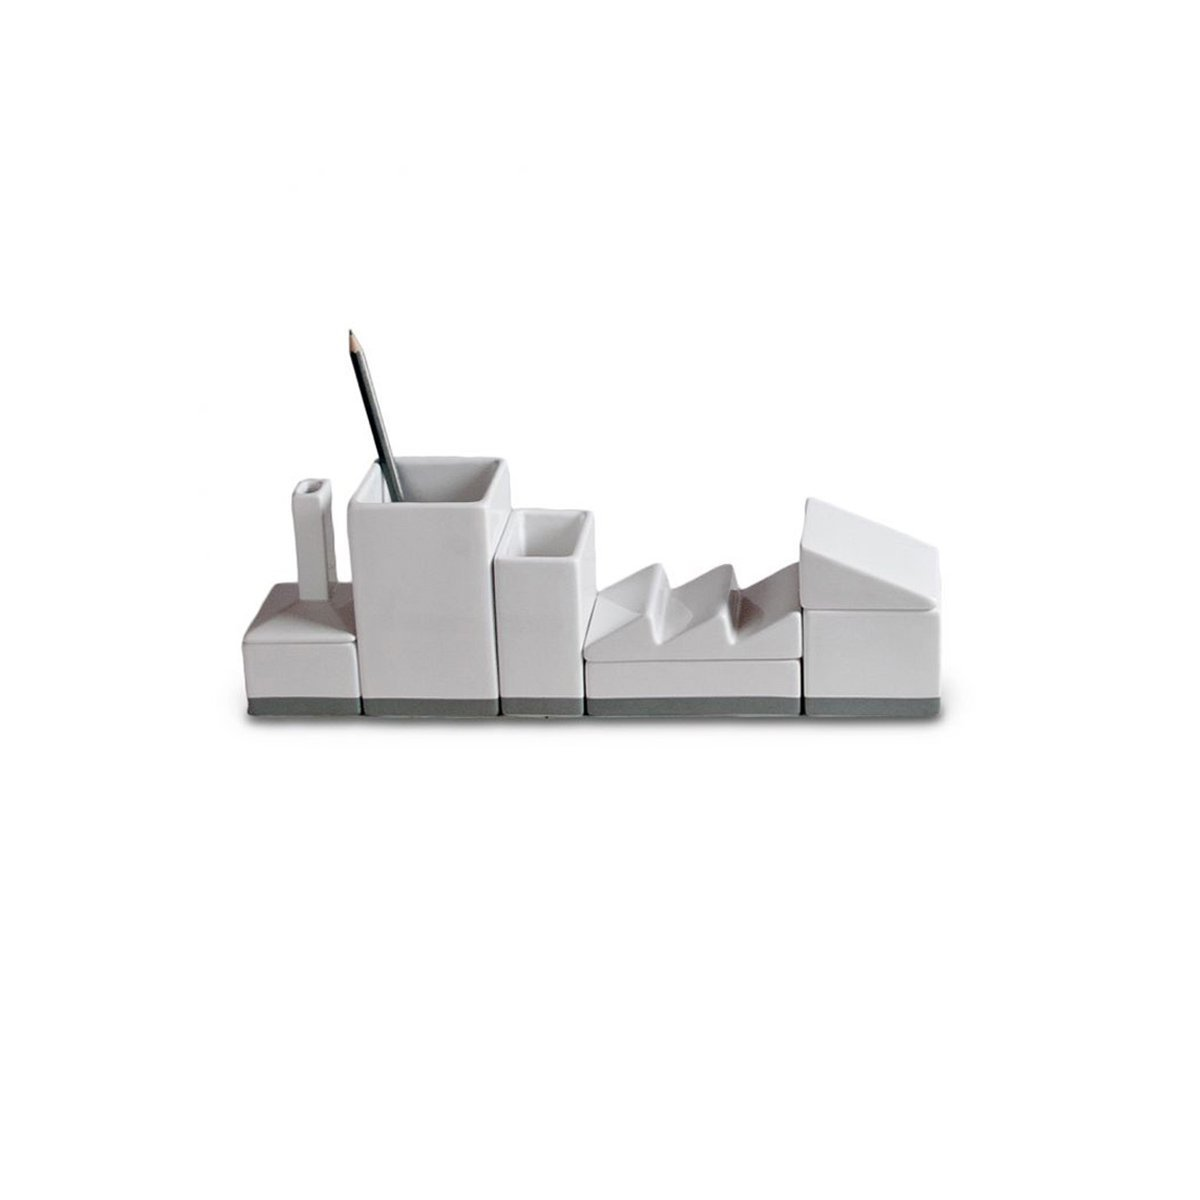 Seletti Vorratsdose deskstructure Lager Organizer Set, Porzellan, Weiß/Grau, 33x 6,5cm Weiß/Grau 33x 6 5cm 10692